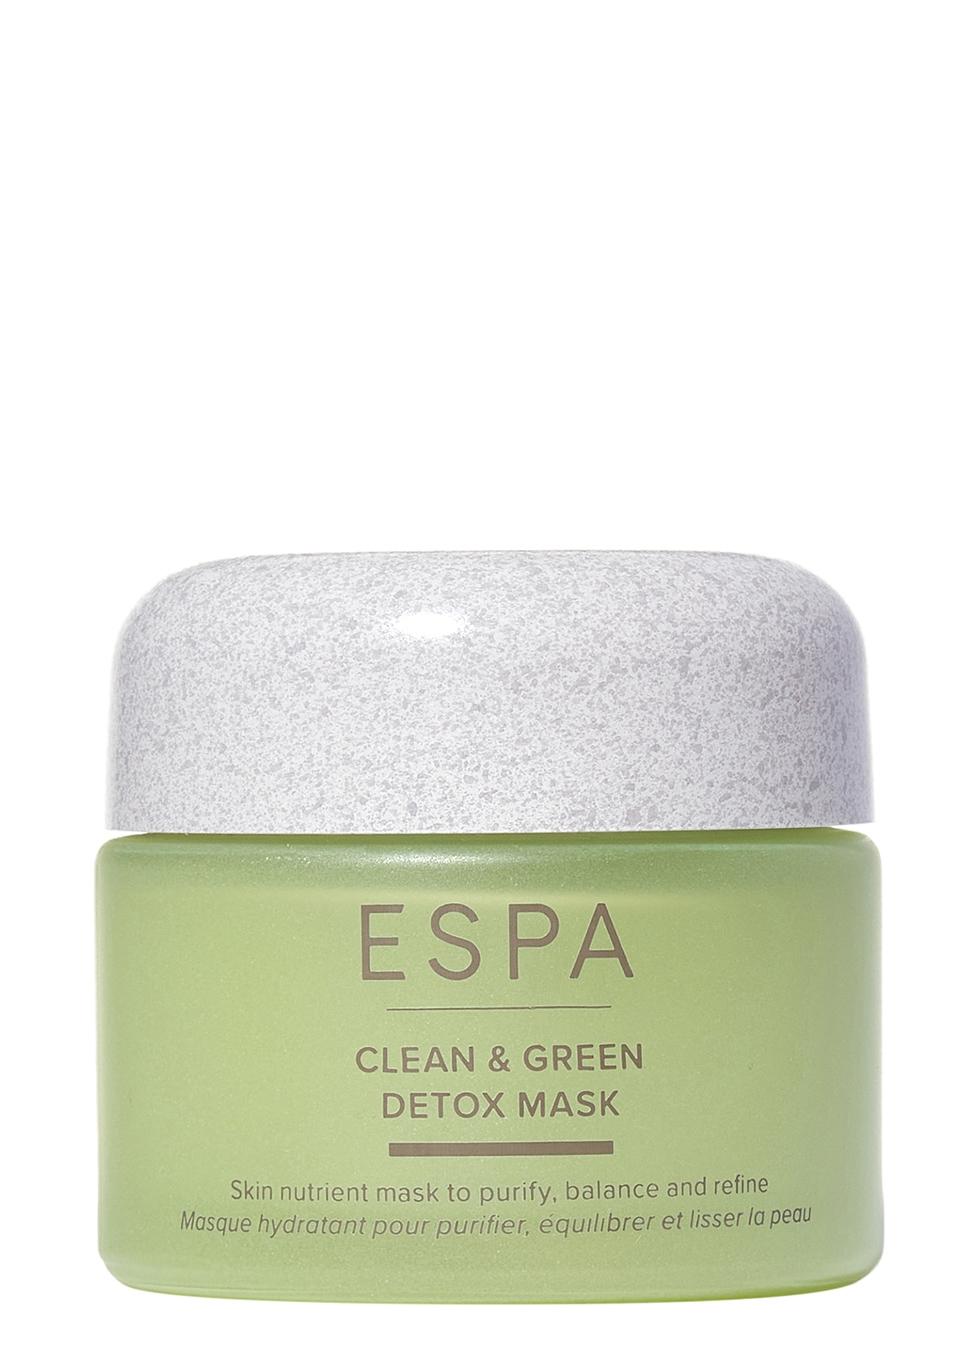 Active Nutrients Clean & Green Detox Mask 55ml